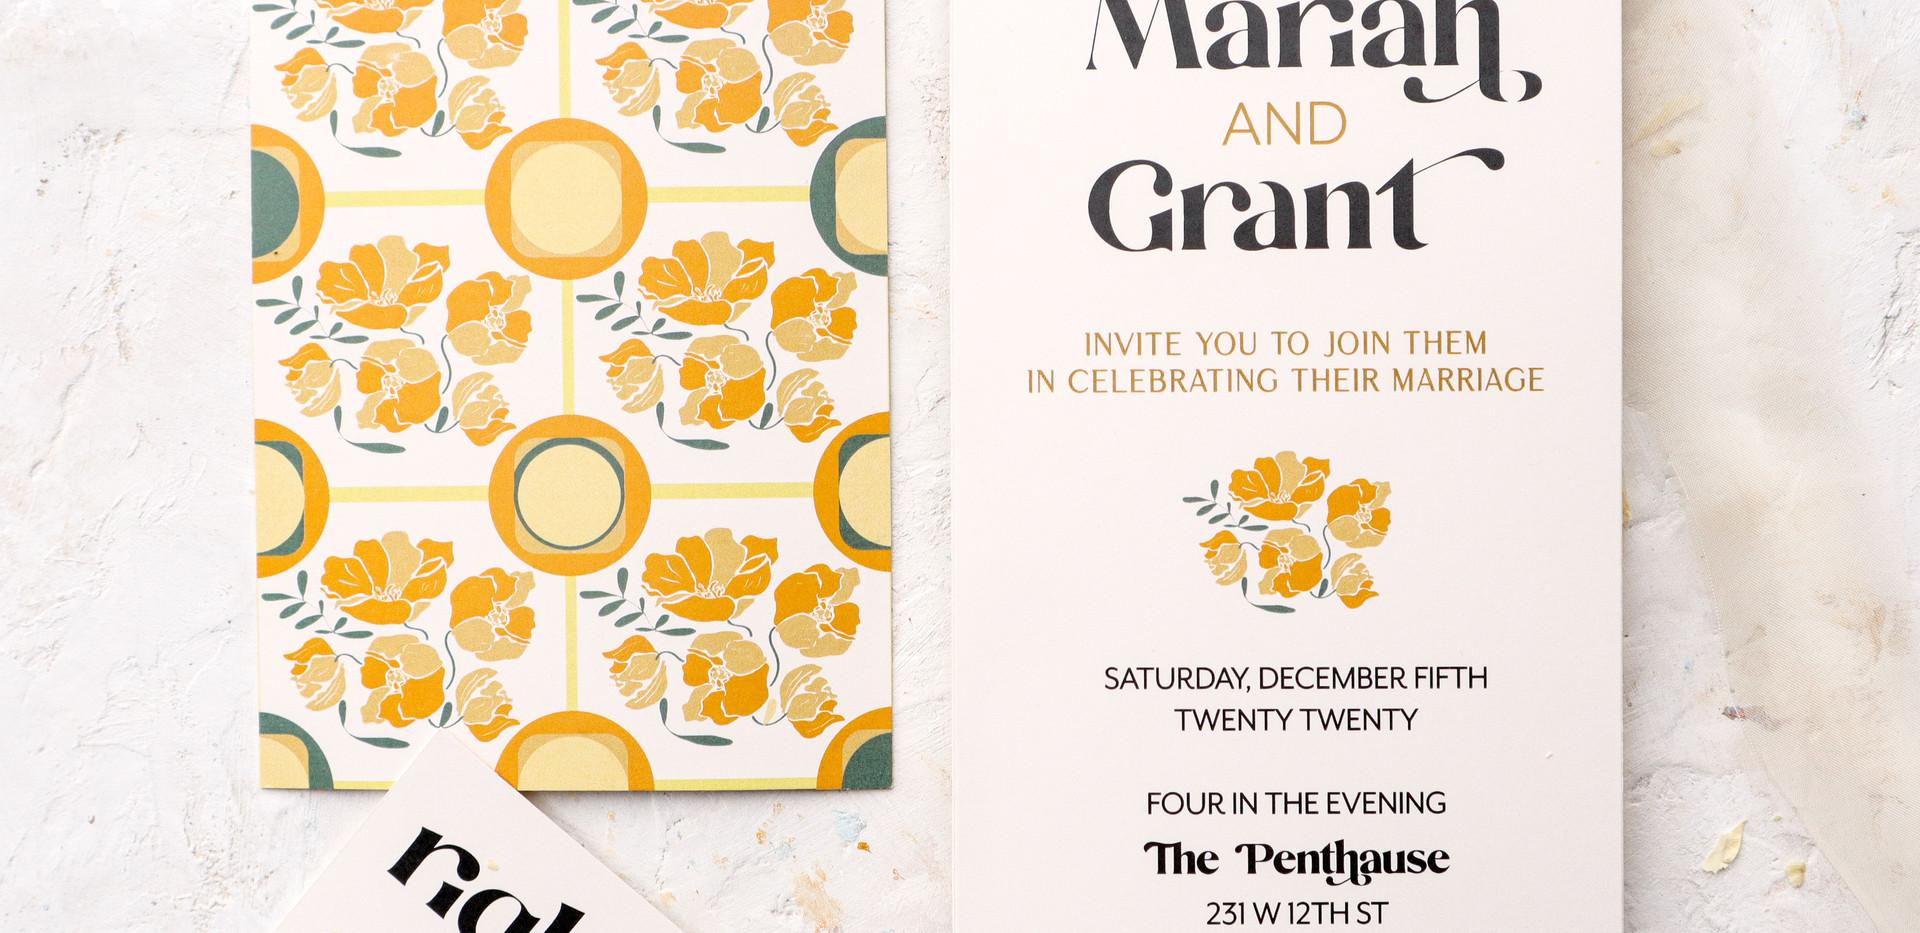 Retro Sun- 70s inspired retro patterned wedding invitations